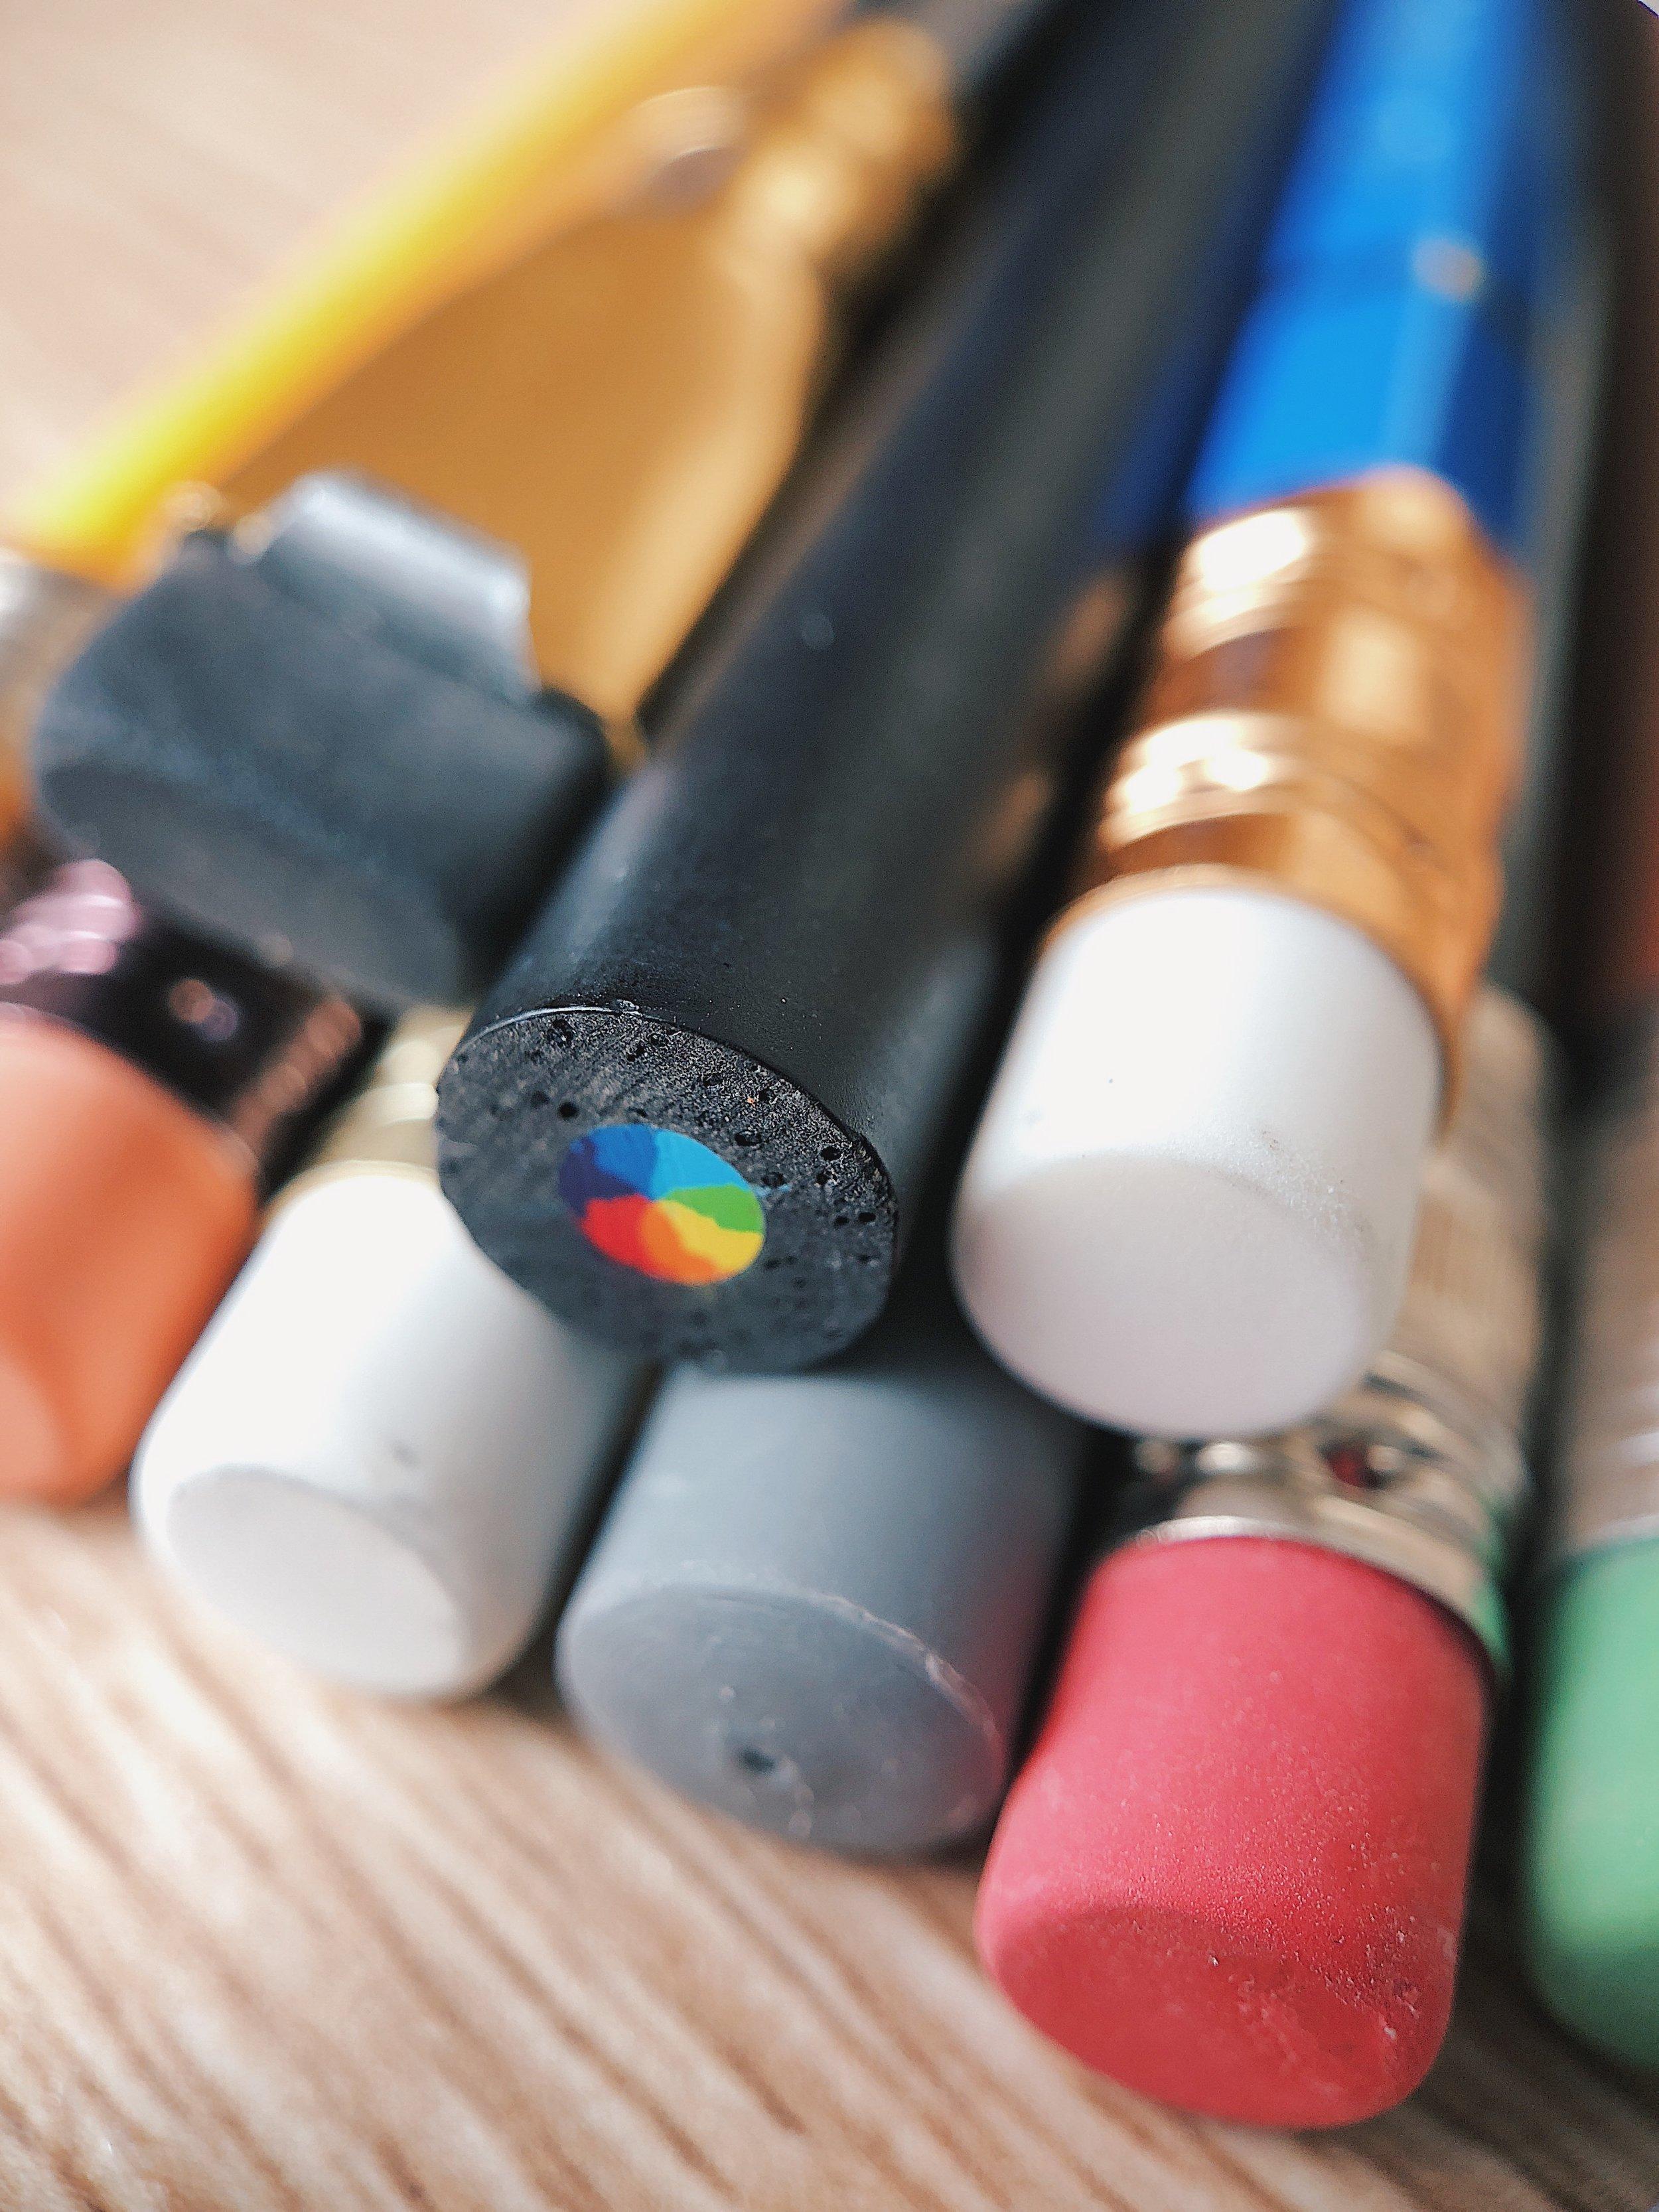 rainbowpencil.jpg